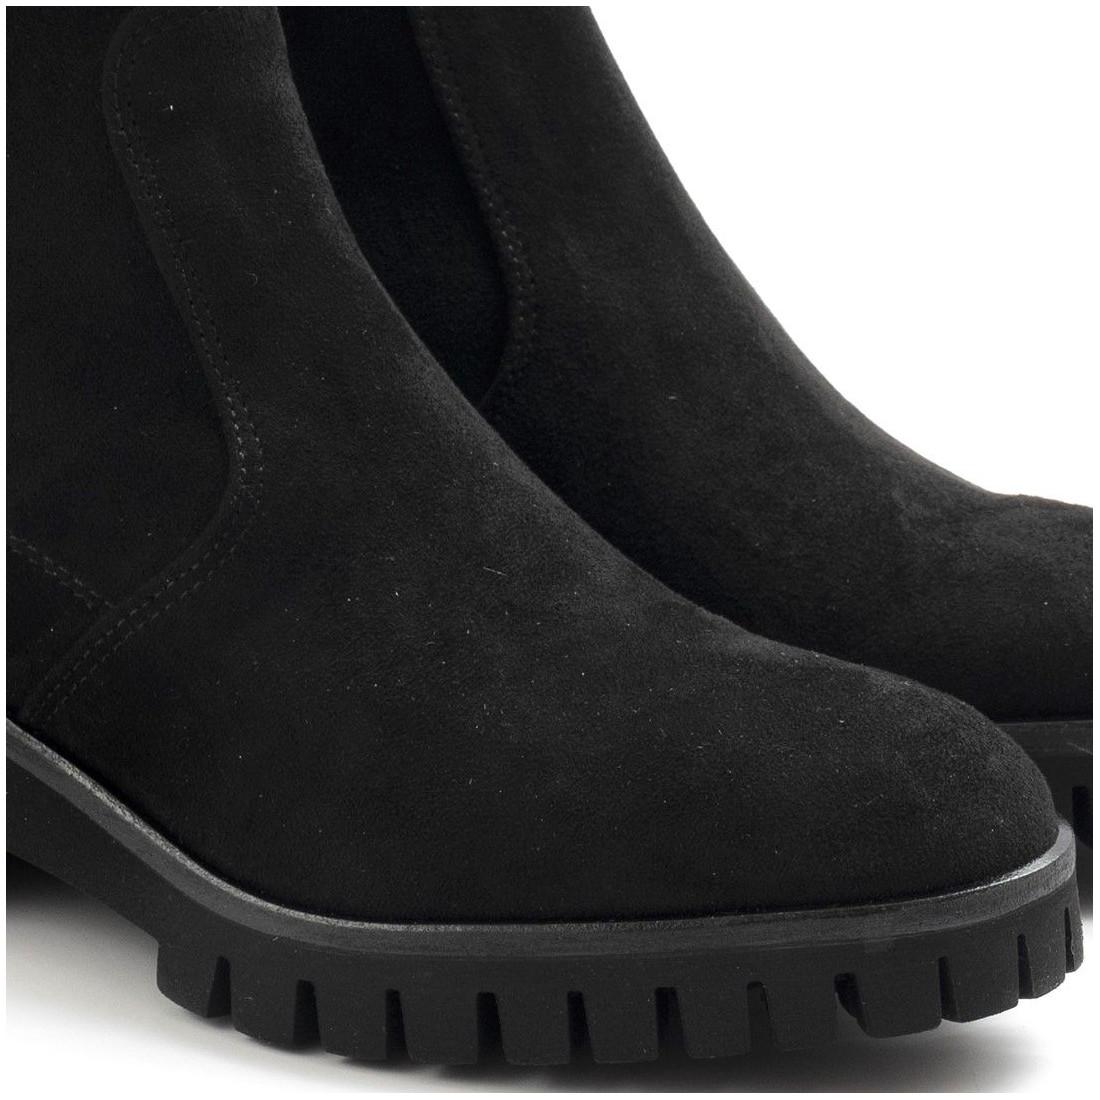 booties woman sangiorgio aritacervo nero 7736